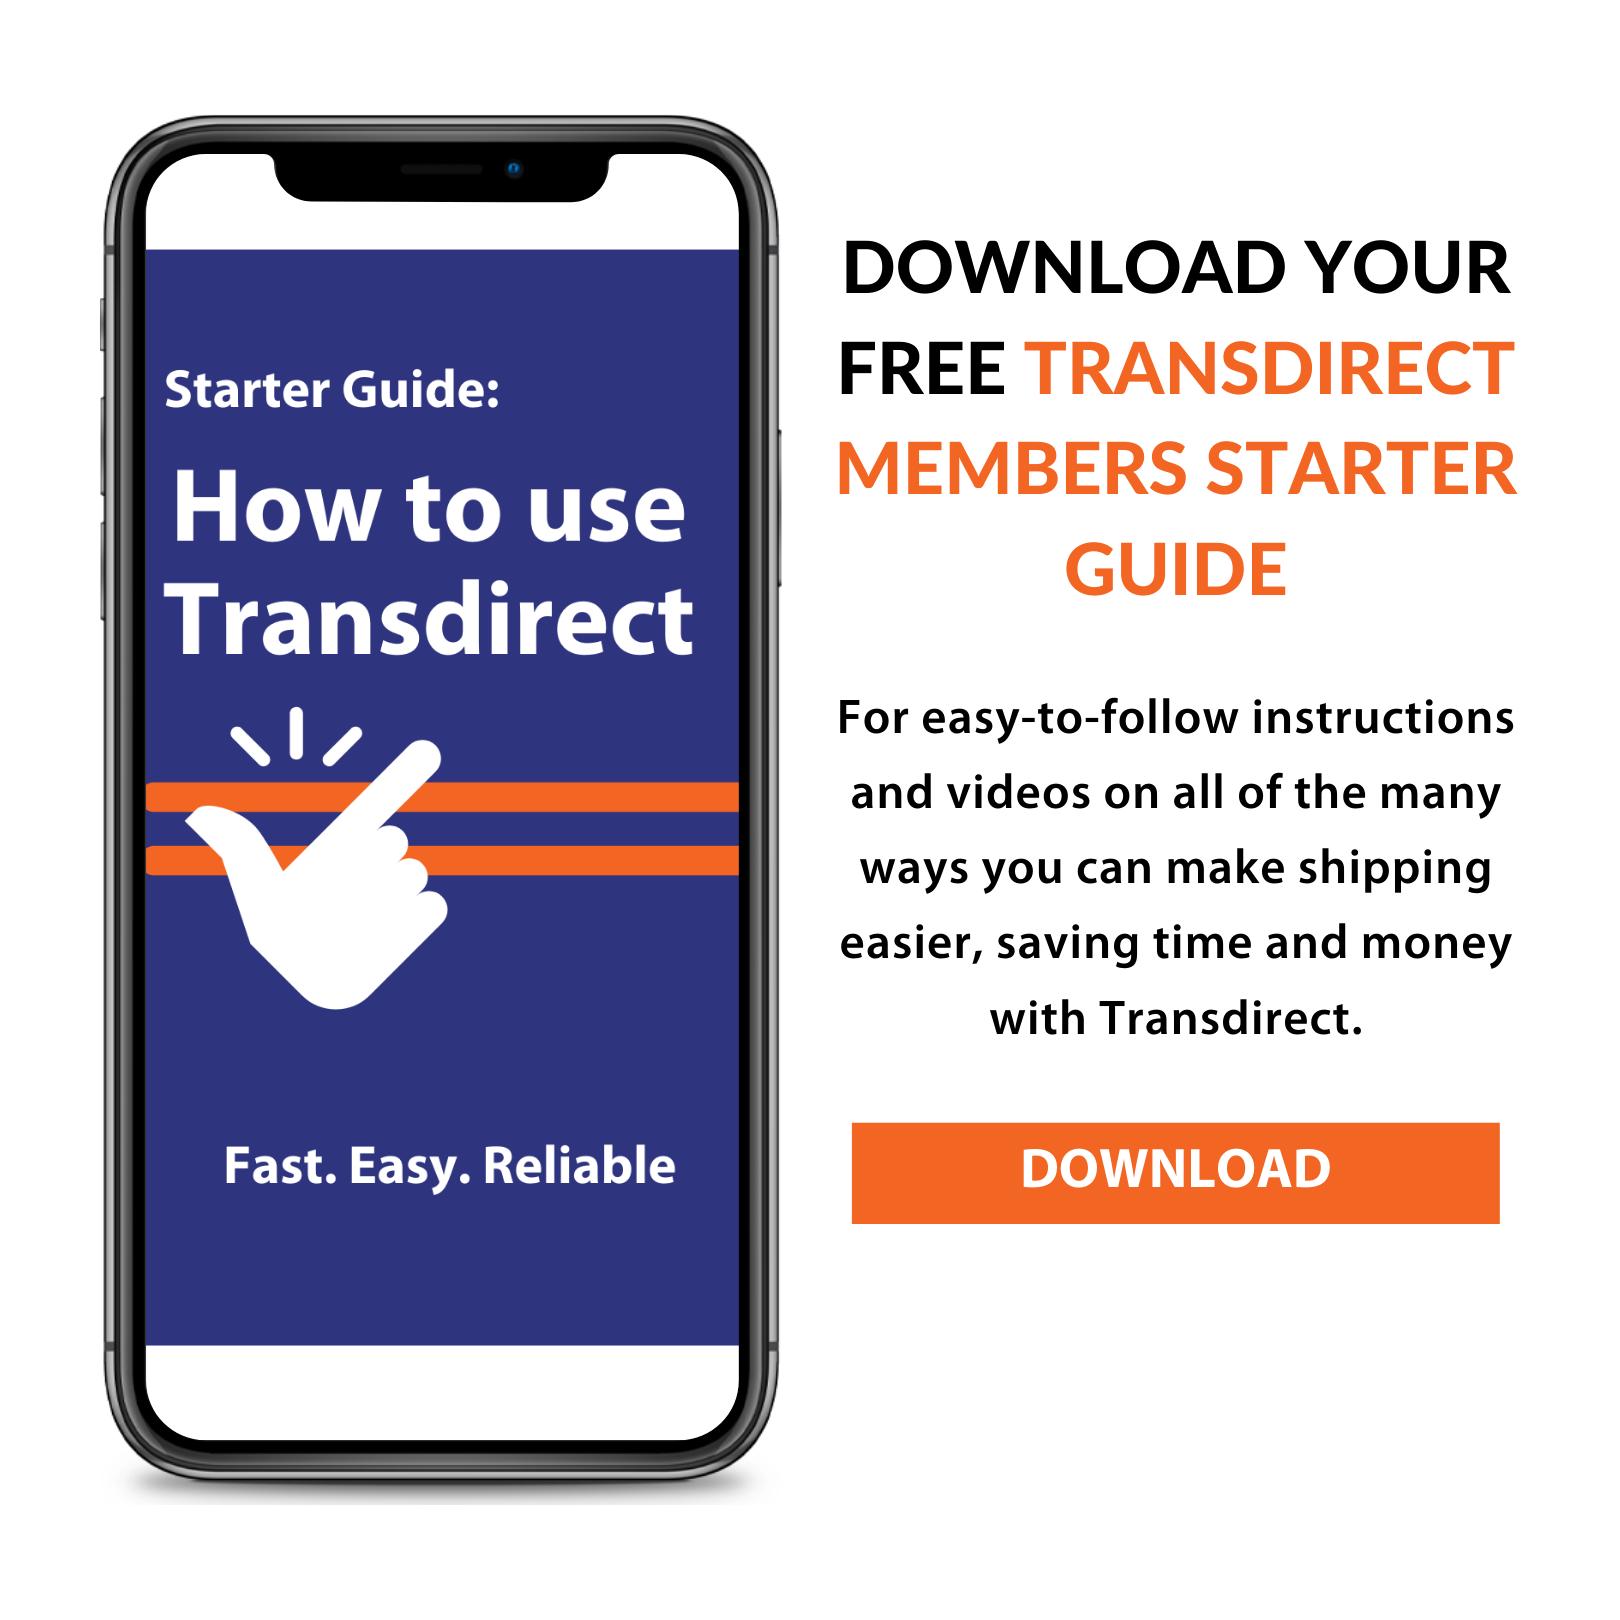 Transdirect starter guide